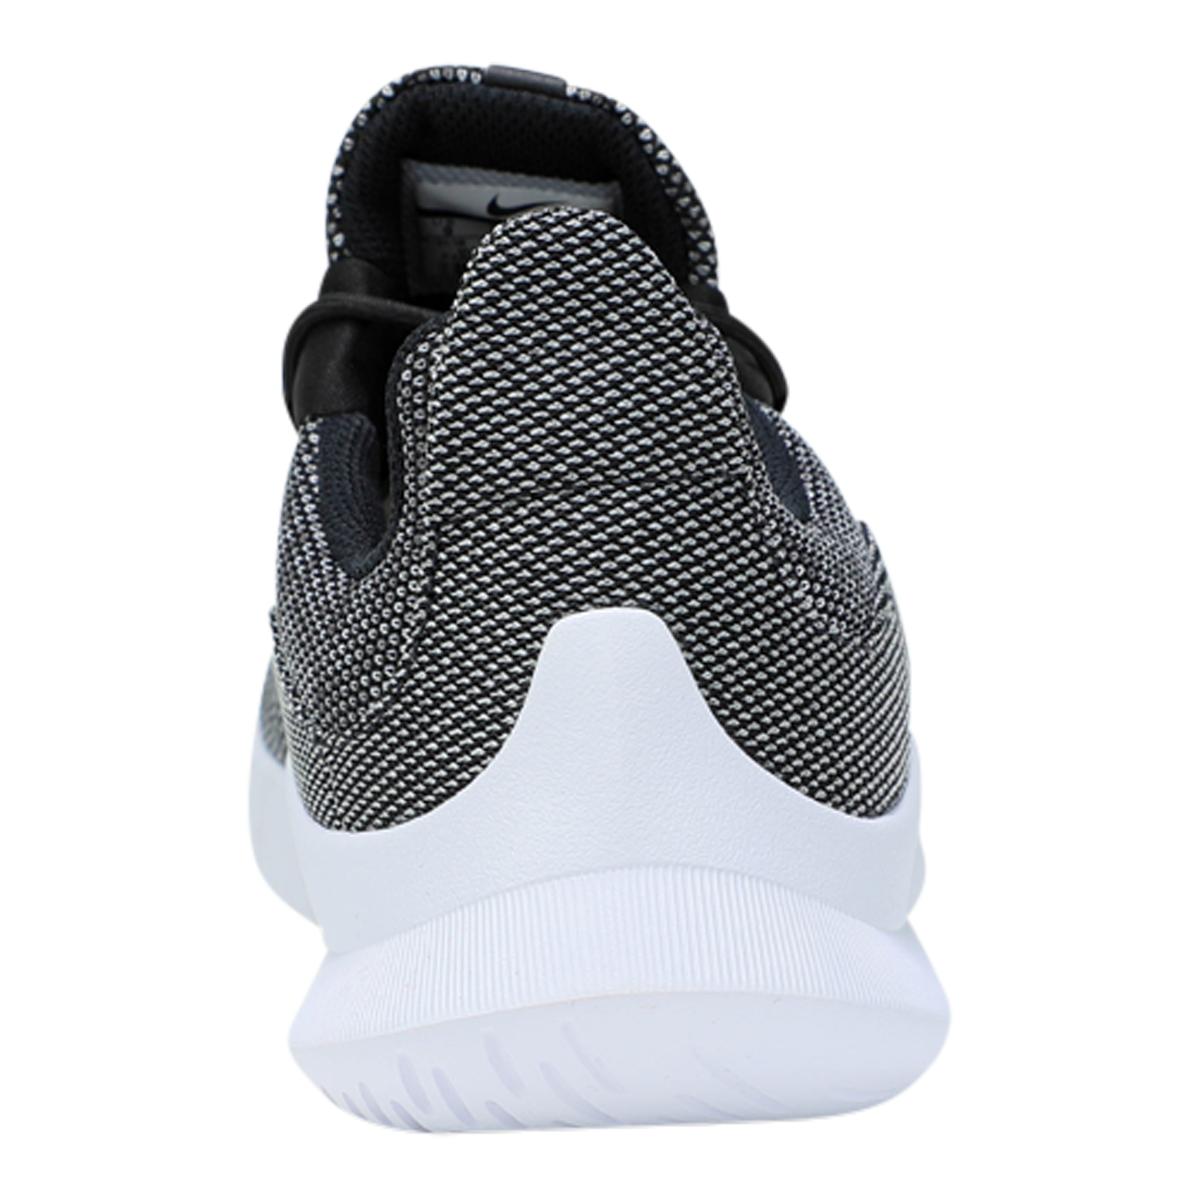 Nike-Men-039-s-Viale-Premium-Running-Shoes thumbnail 10